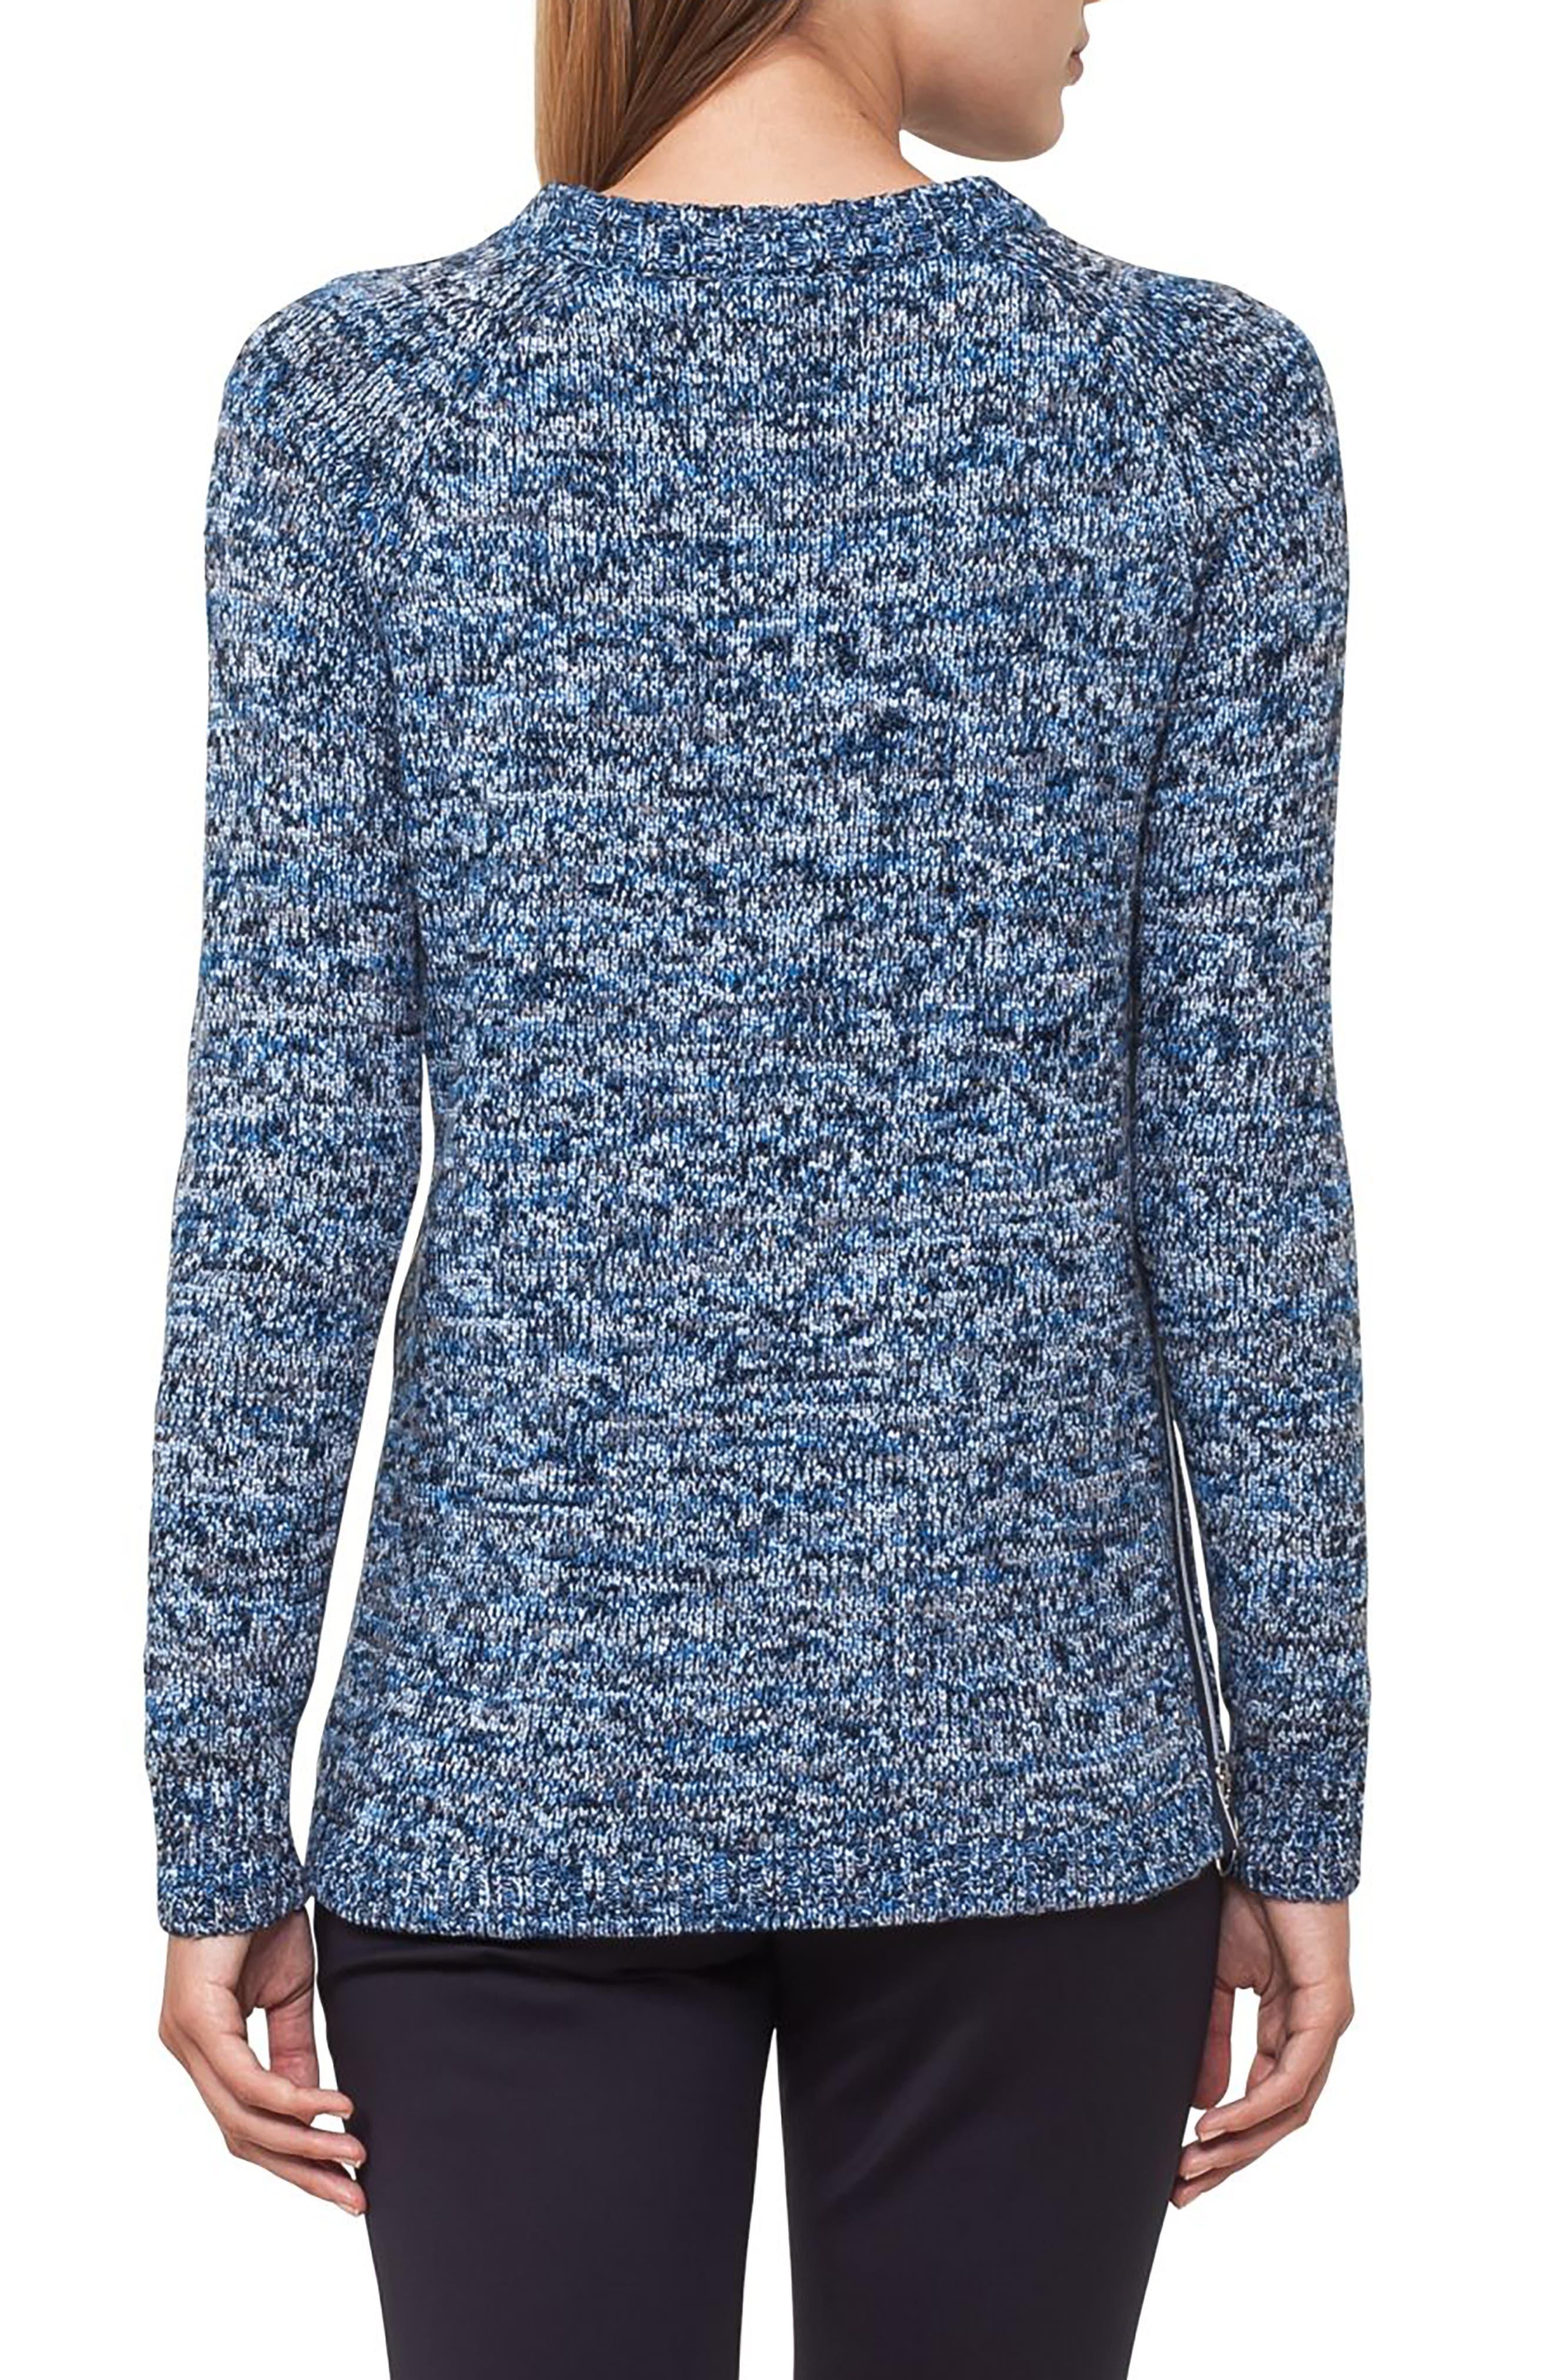 Cotton Blend Knit Pullover,                             Alternate thumbnail 2, color,                             Indigo-Cream